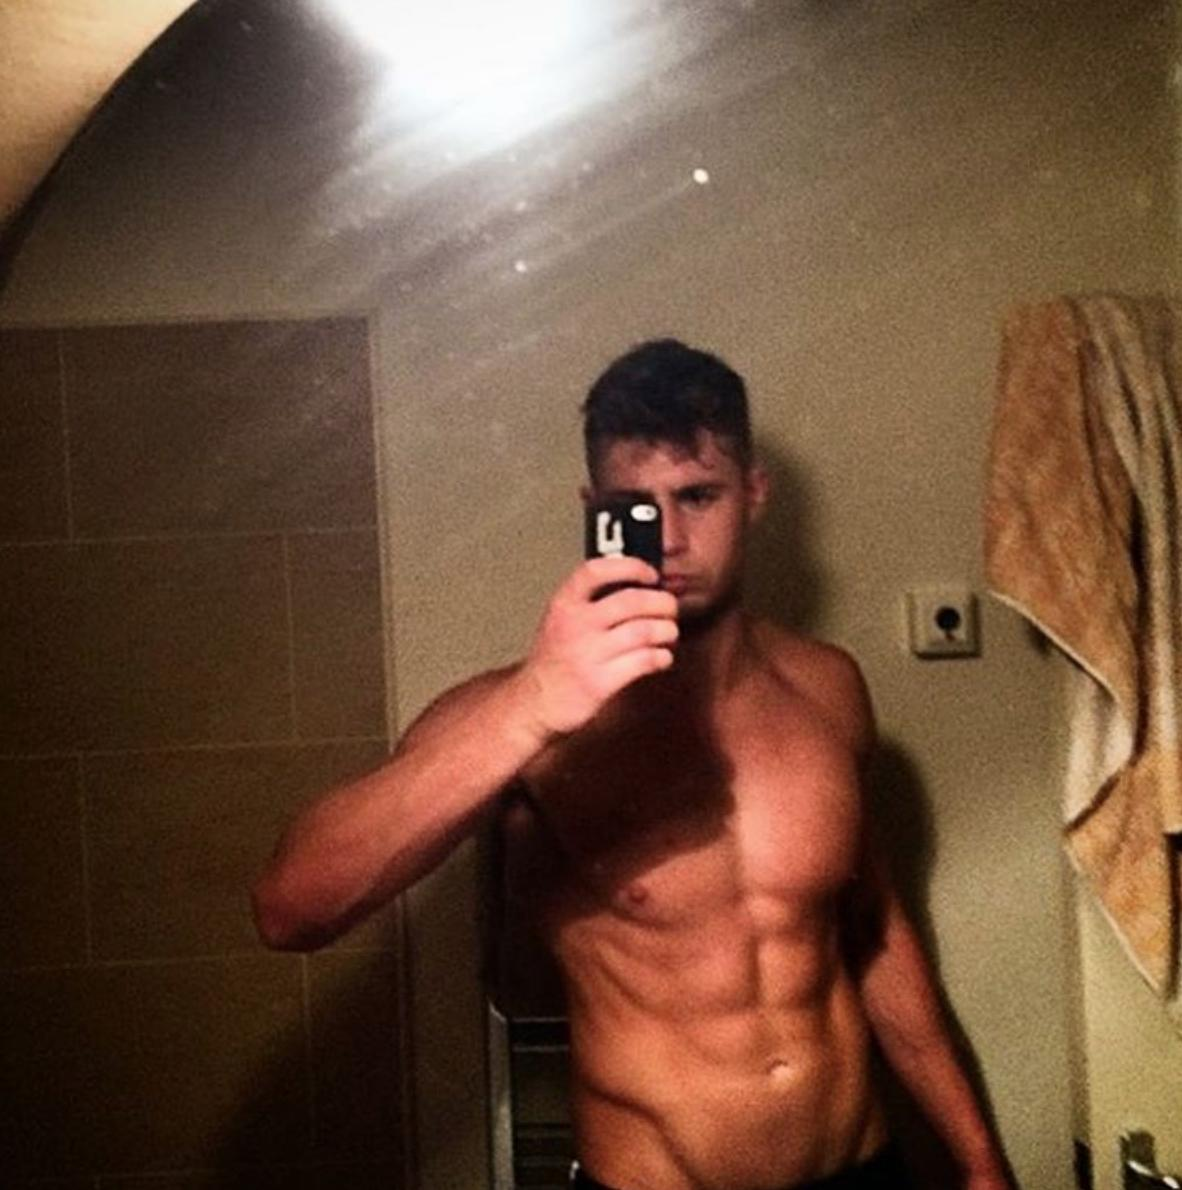 Hot Jodie Williams naked (65 photo), Pussy, Sideboobs, Twitter, underwear 2020